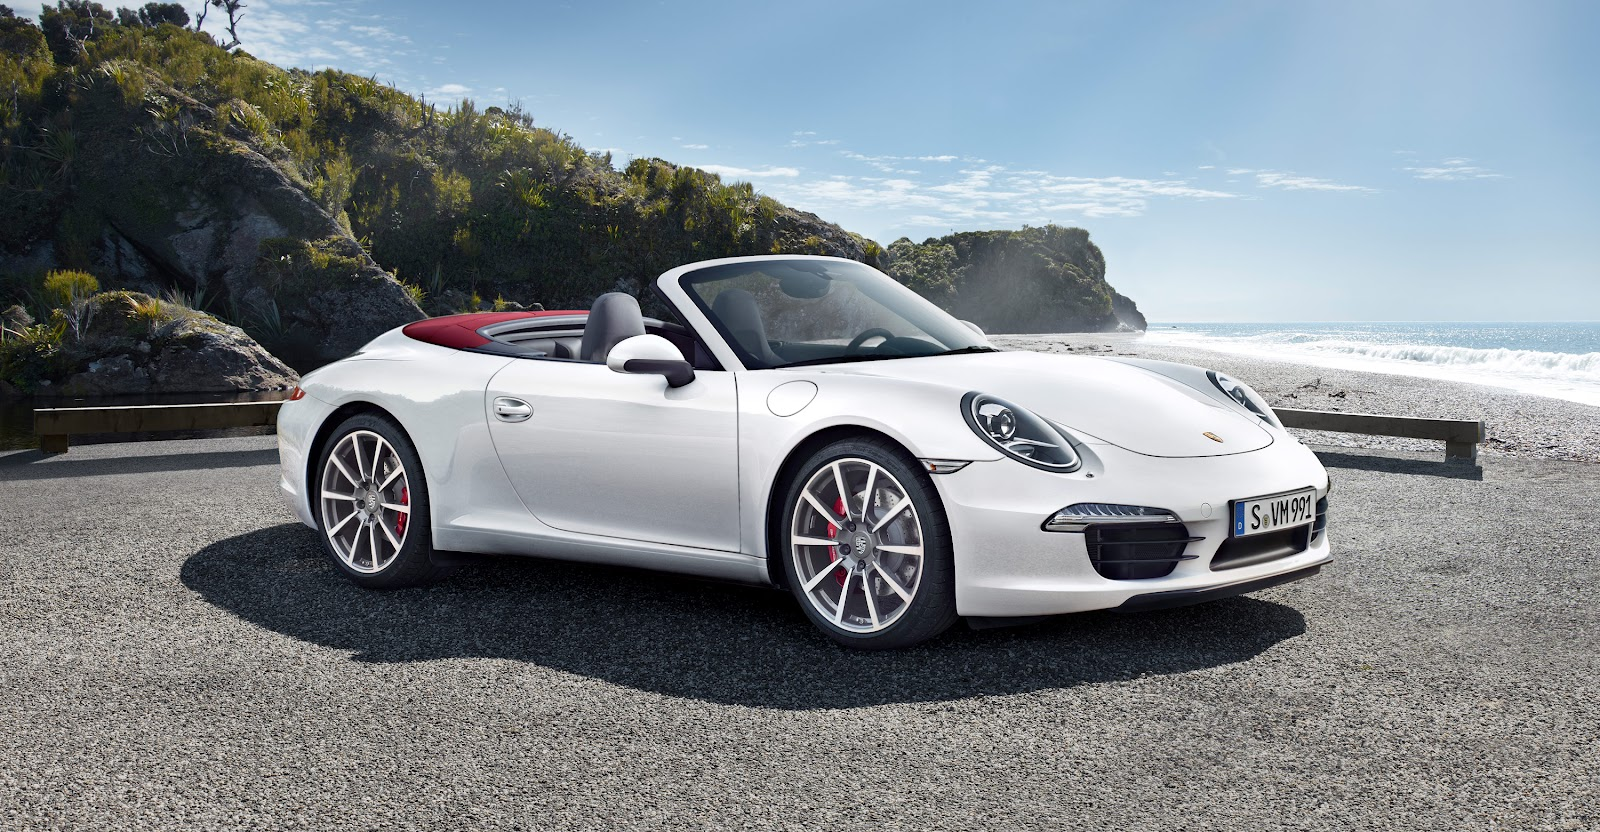 Sport Cars Porsche 911 Carrera 4 Gts Cabriolet Hd